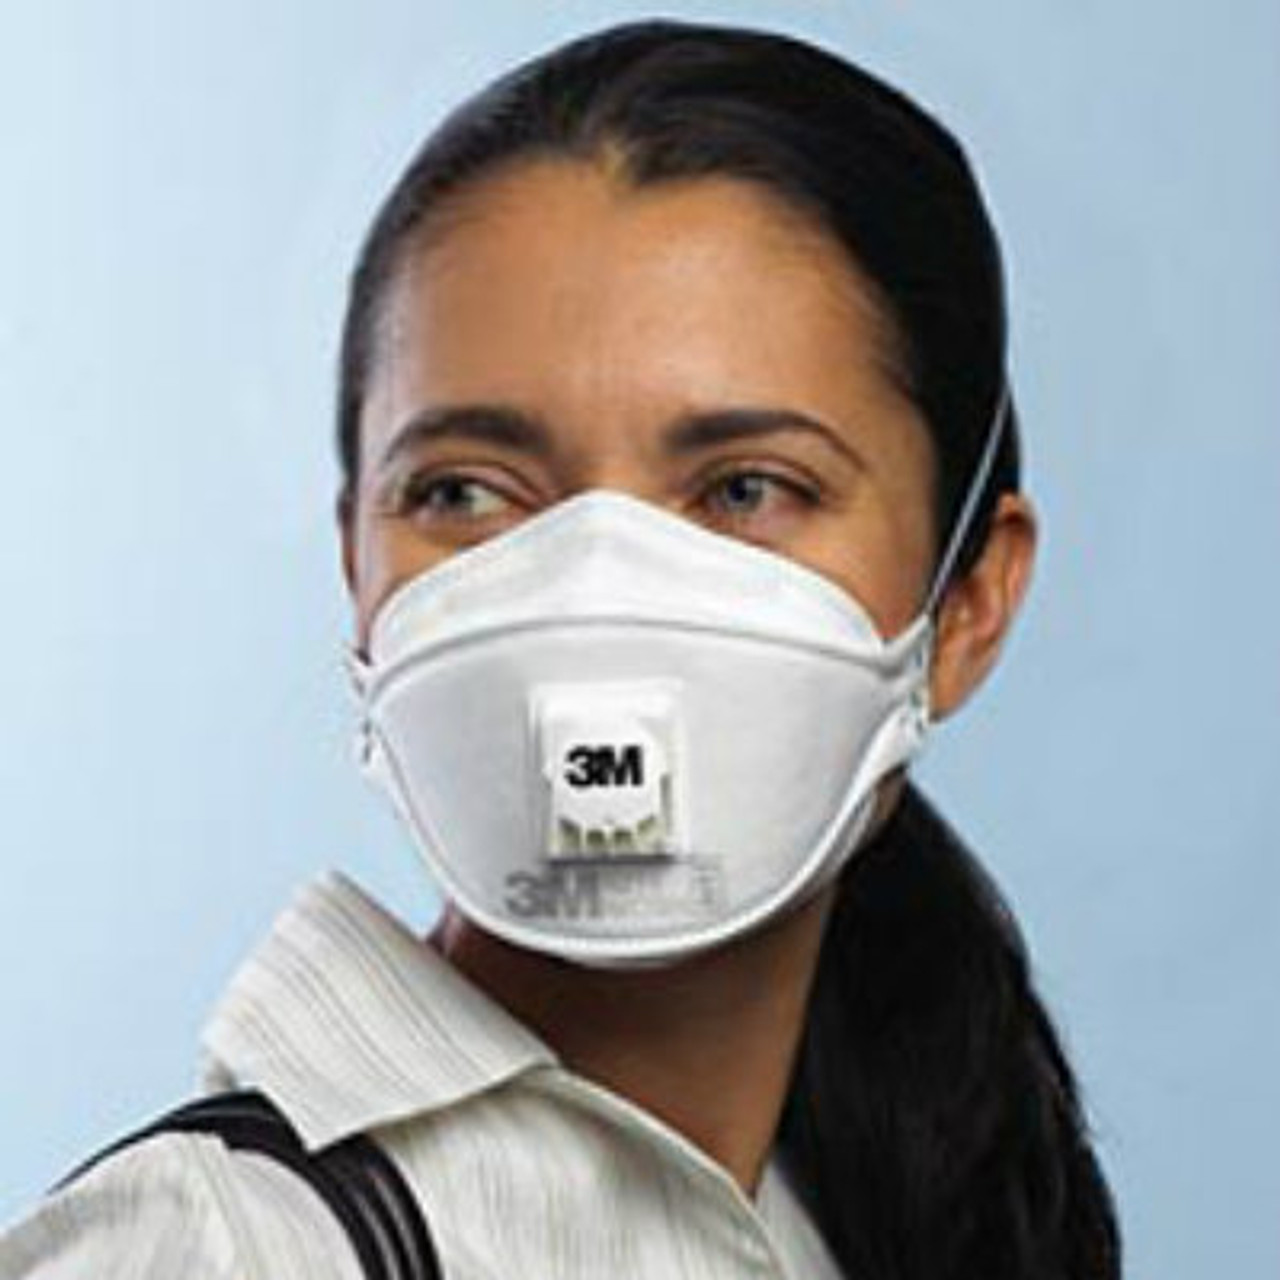 3M Aura #9211plus  N95 Respirator - 10 per Box